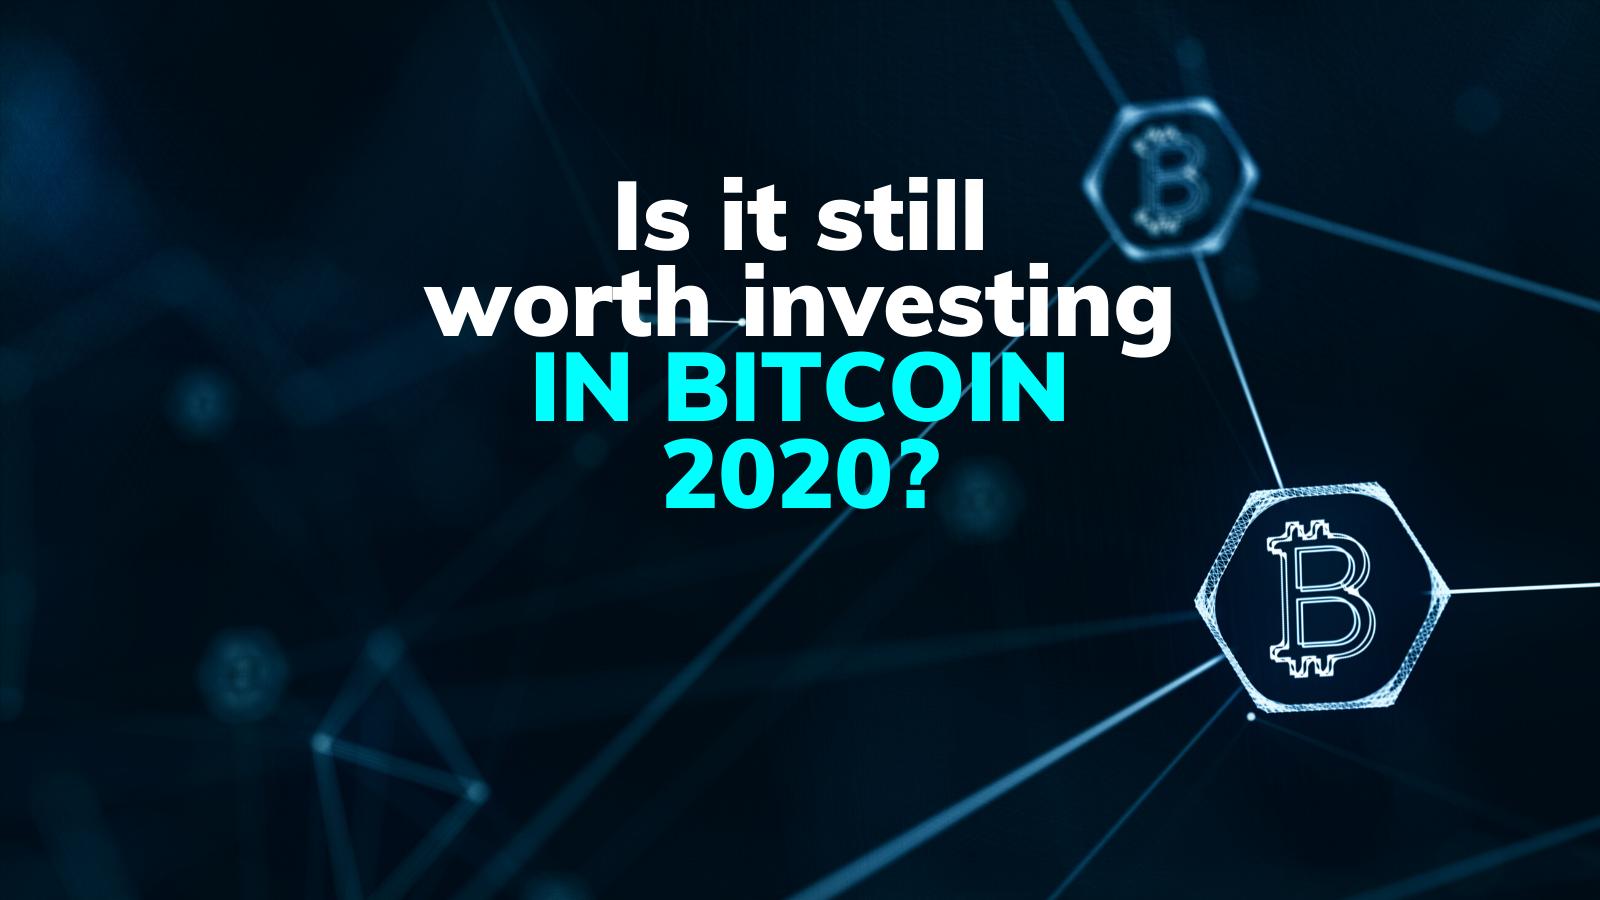 investind bitcoins